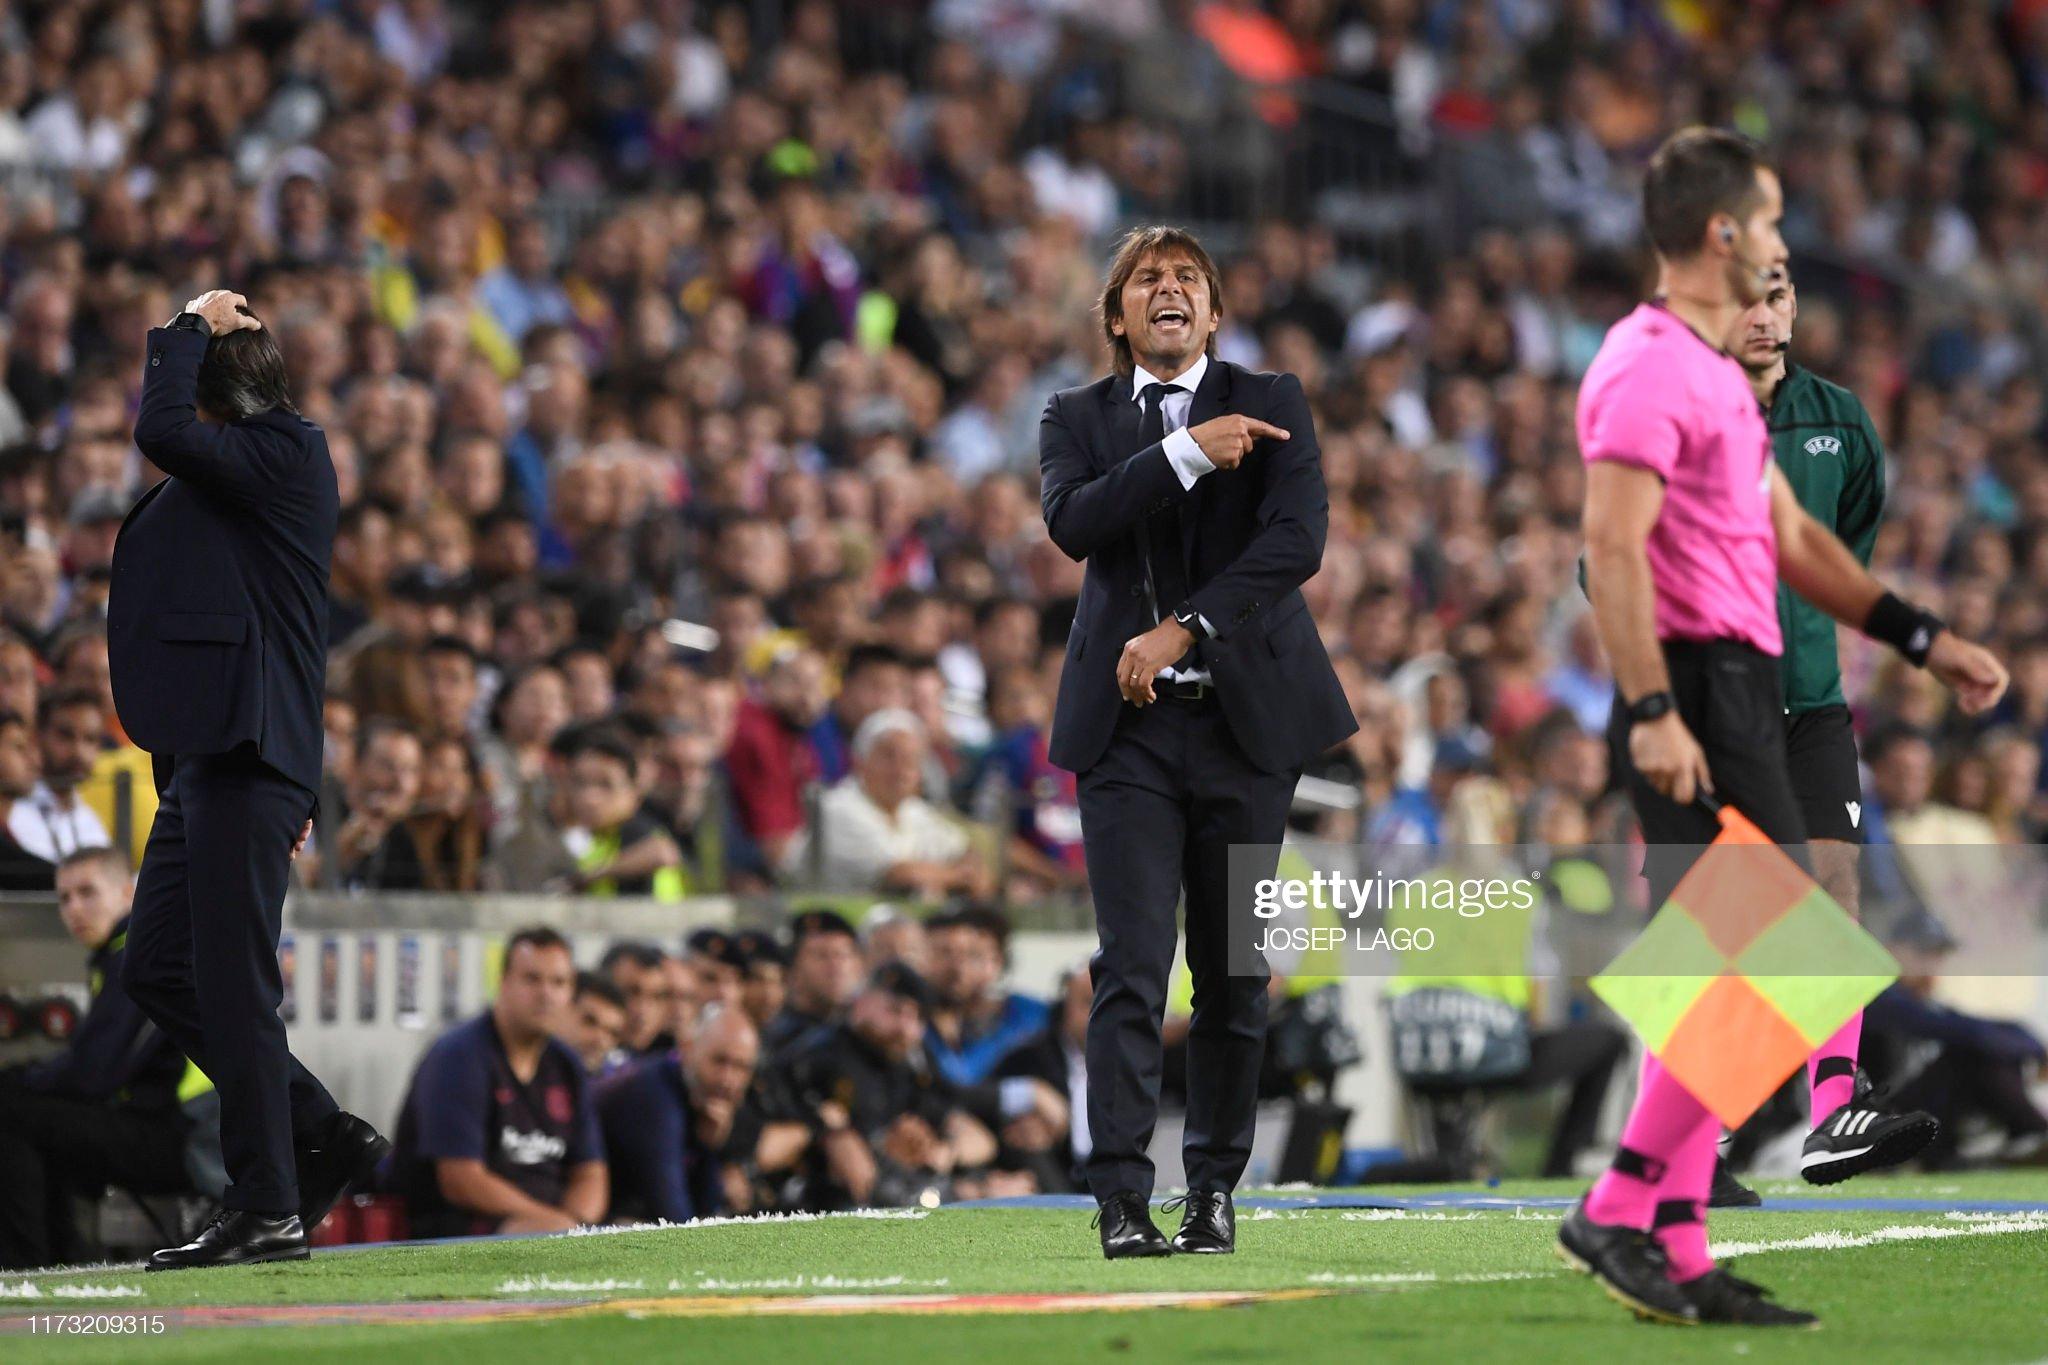 صور مباراة : برشلونة - إنتر 2-1 ( 02-10-2019 )  Inter-milans-italian-coach-antonio-conte-gestures-to-a-referee-during-picture-id1173209315?s=2048x2048